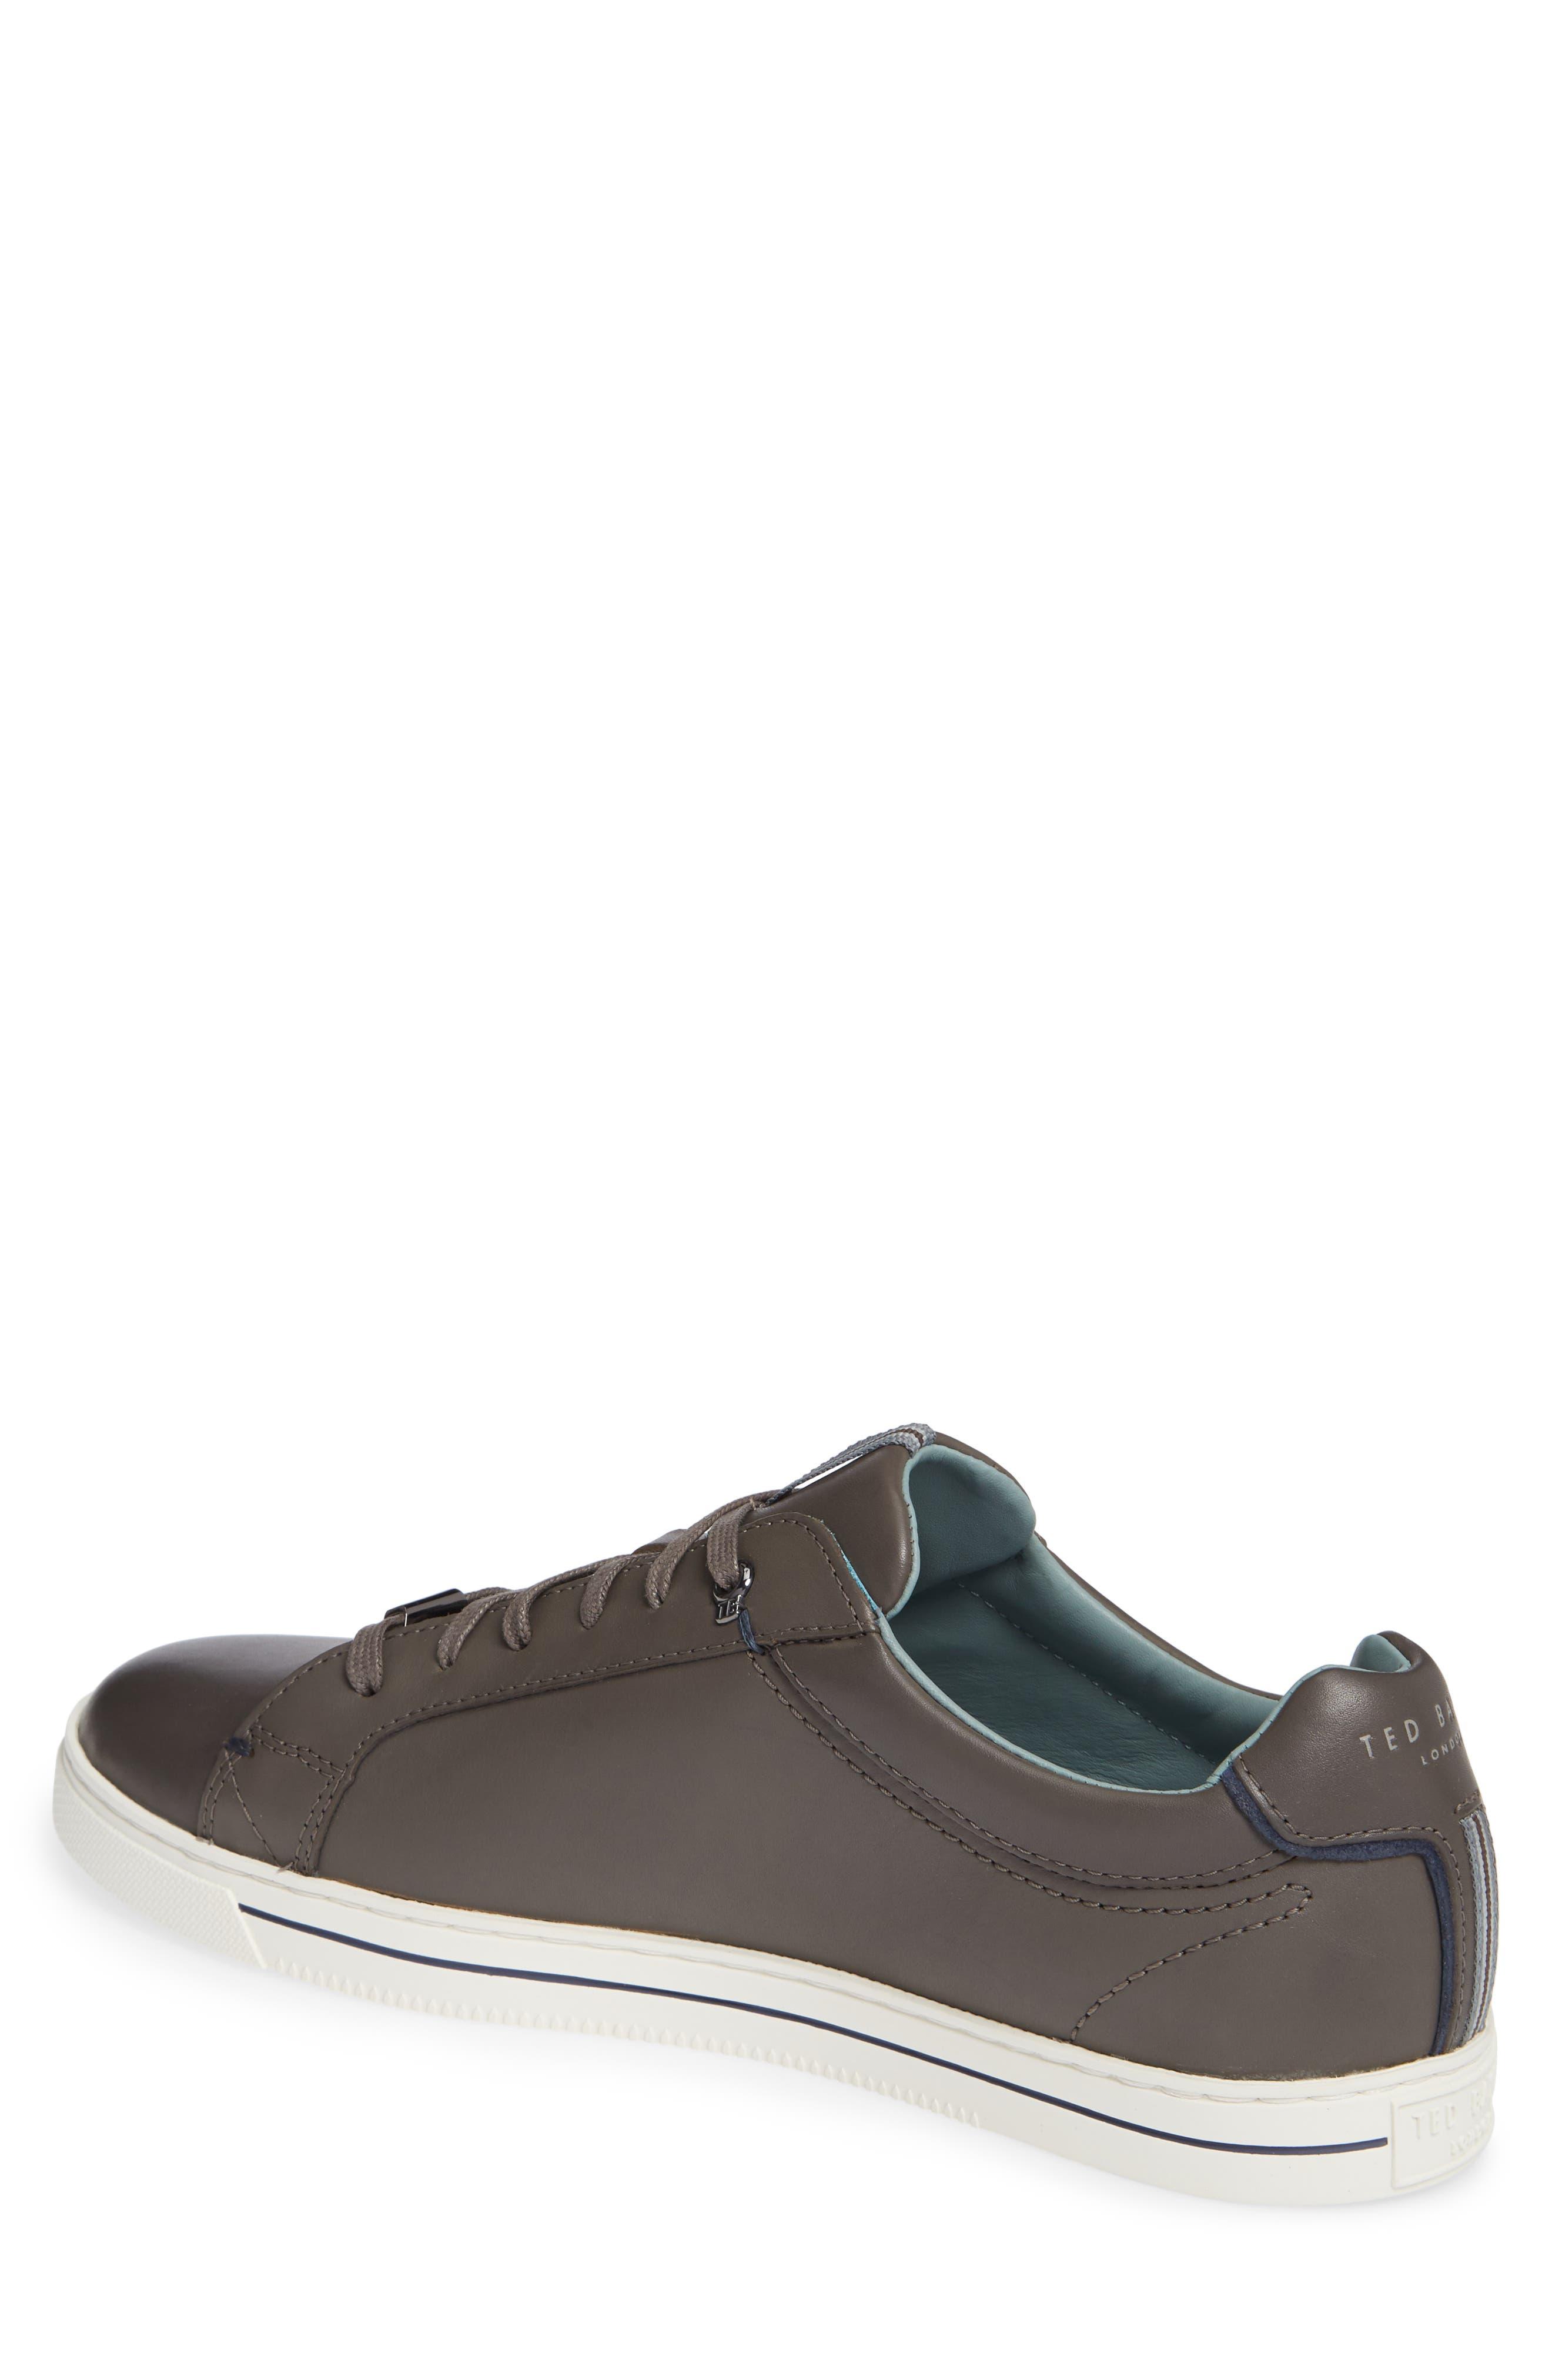 Thawne Sneaker,                             Alternate thumbnail 2, color,                             DARK GREY LEATHER